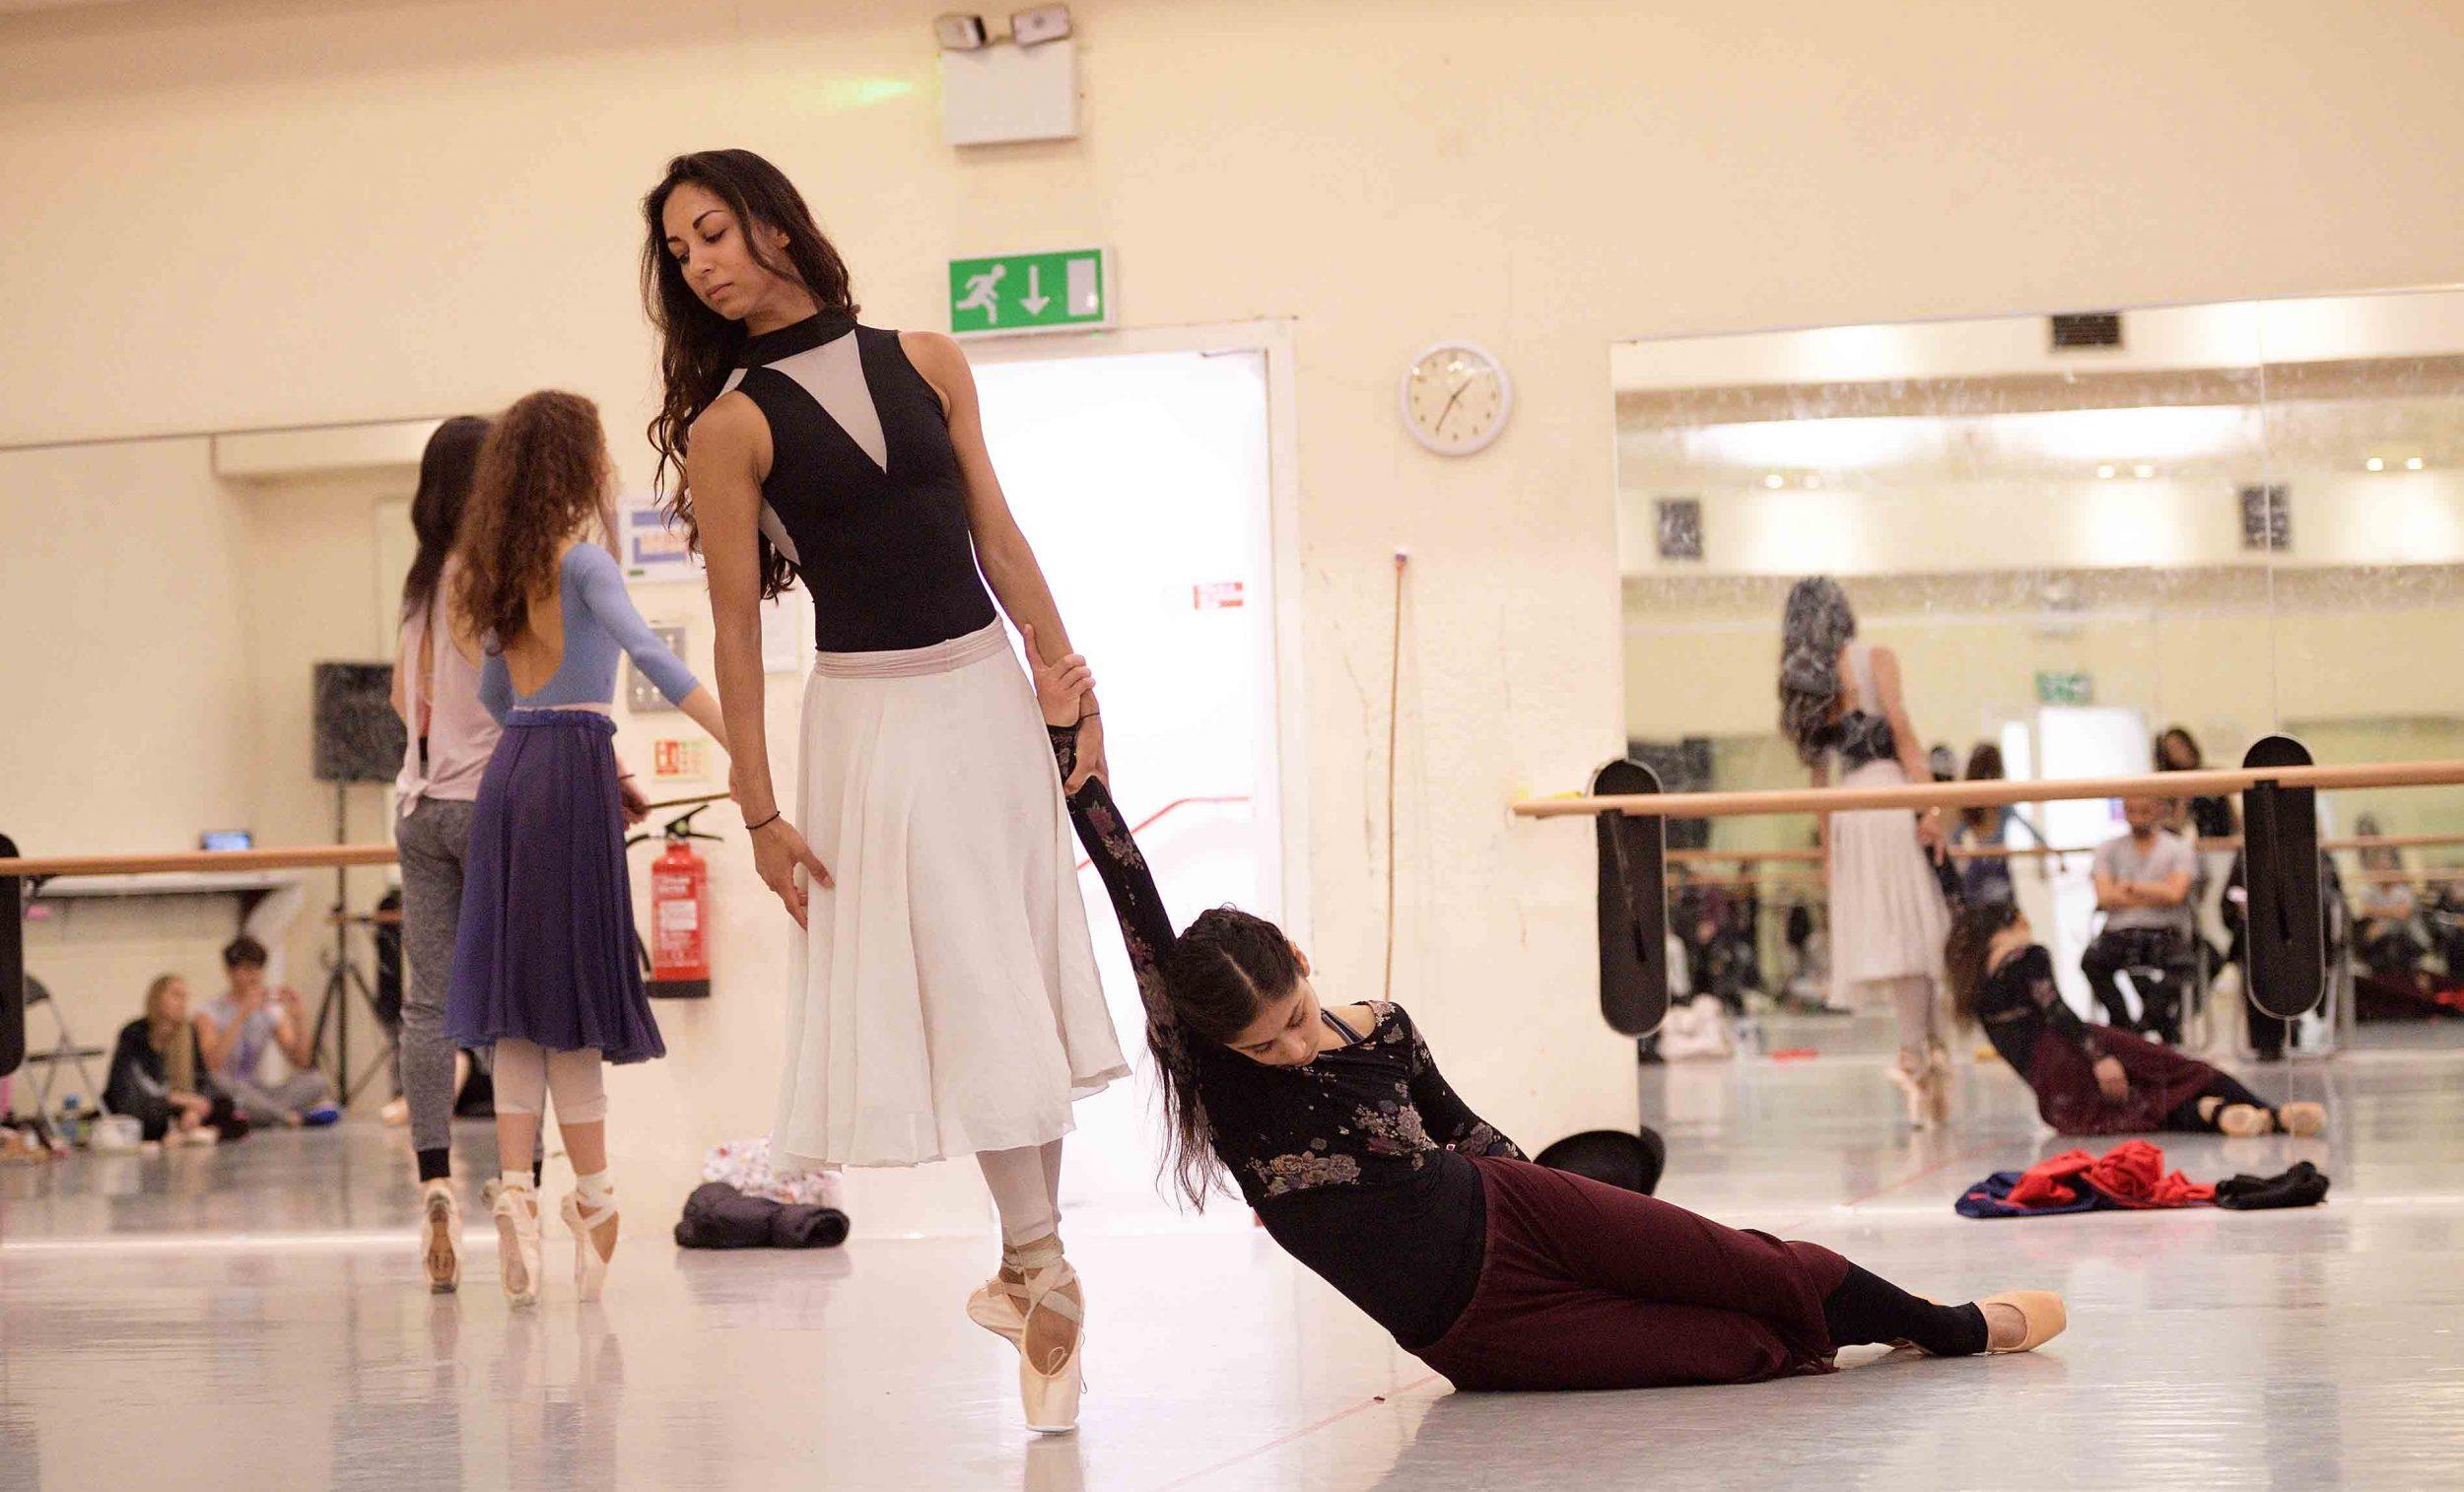 Crystal-Costa-and-Sarah-Kundi-rehearsing-Akram-Khan's-Giselle-©-Laurent-Liotardo--(2)